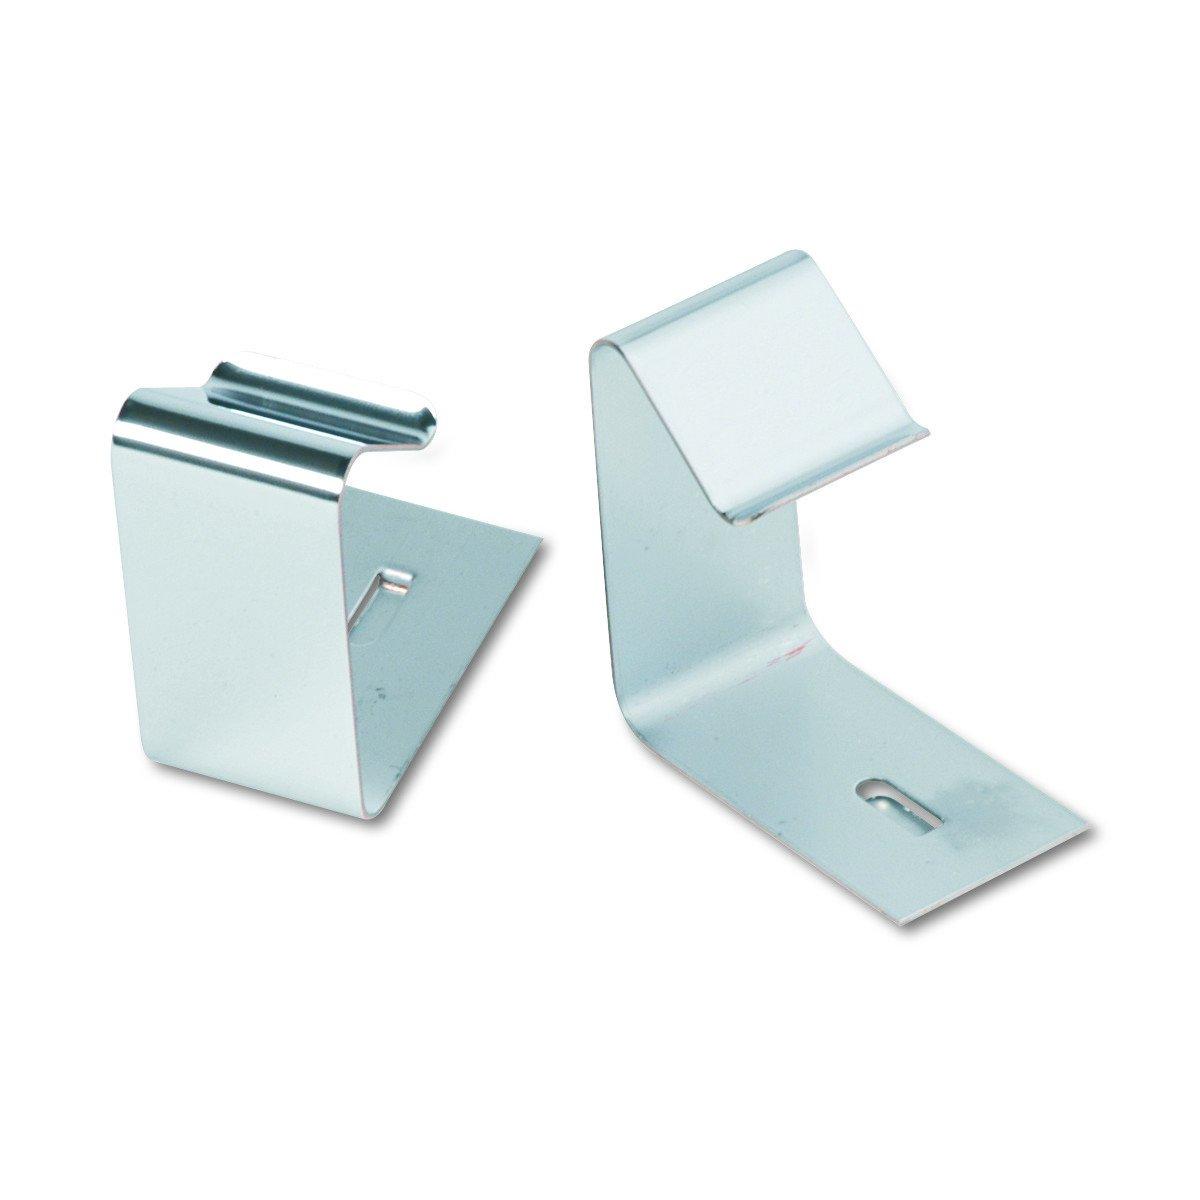 Quartet 7501 Flexible metal hangers for panels 1-1/2-2-1/2 thick, 2 hangers/set ACCO Brands Canada Inc.